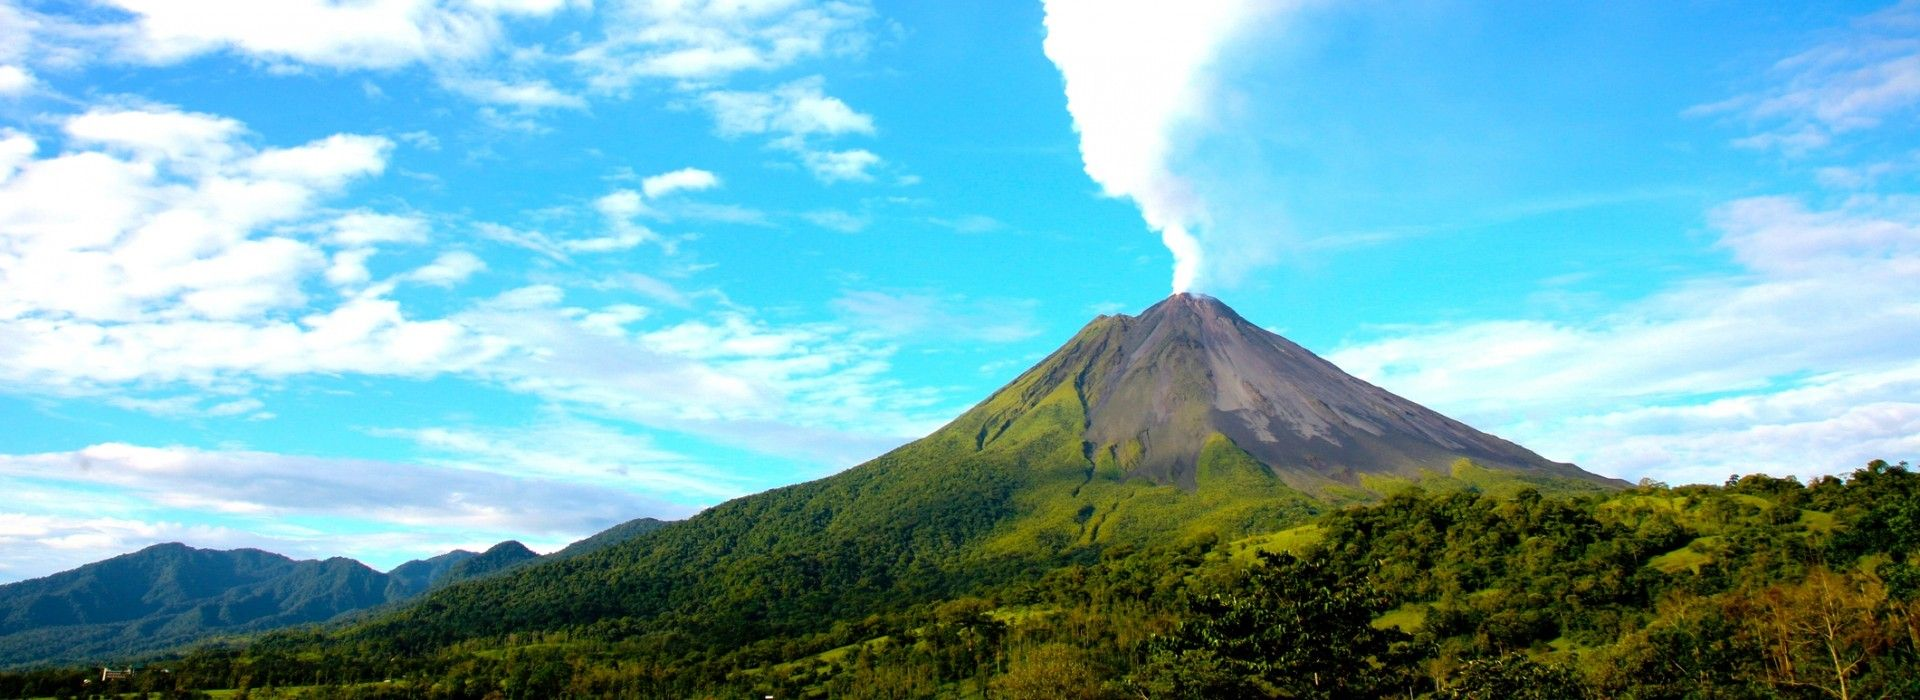 Trekking Tours in Costa Rica